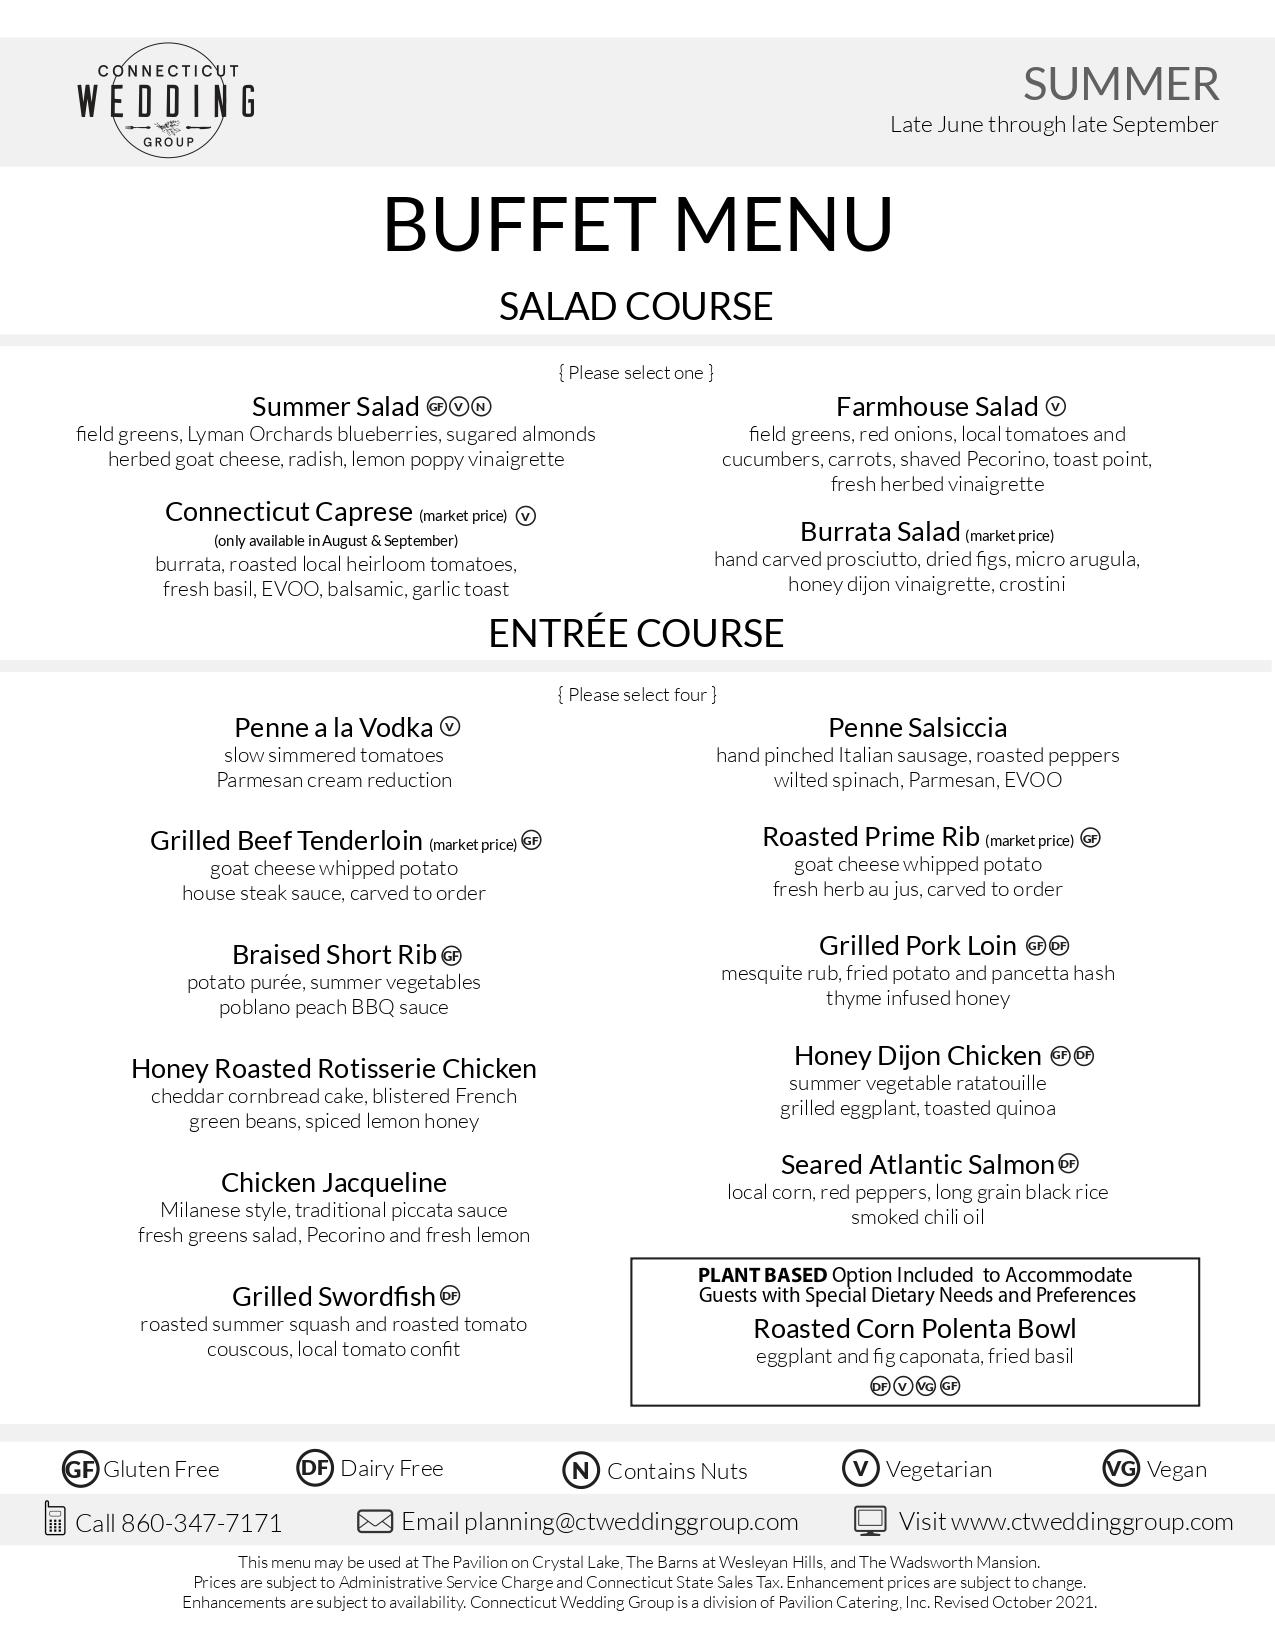 Summer-Buffet-Menu-2022_NEW_page-0001-1